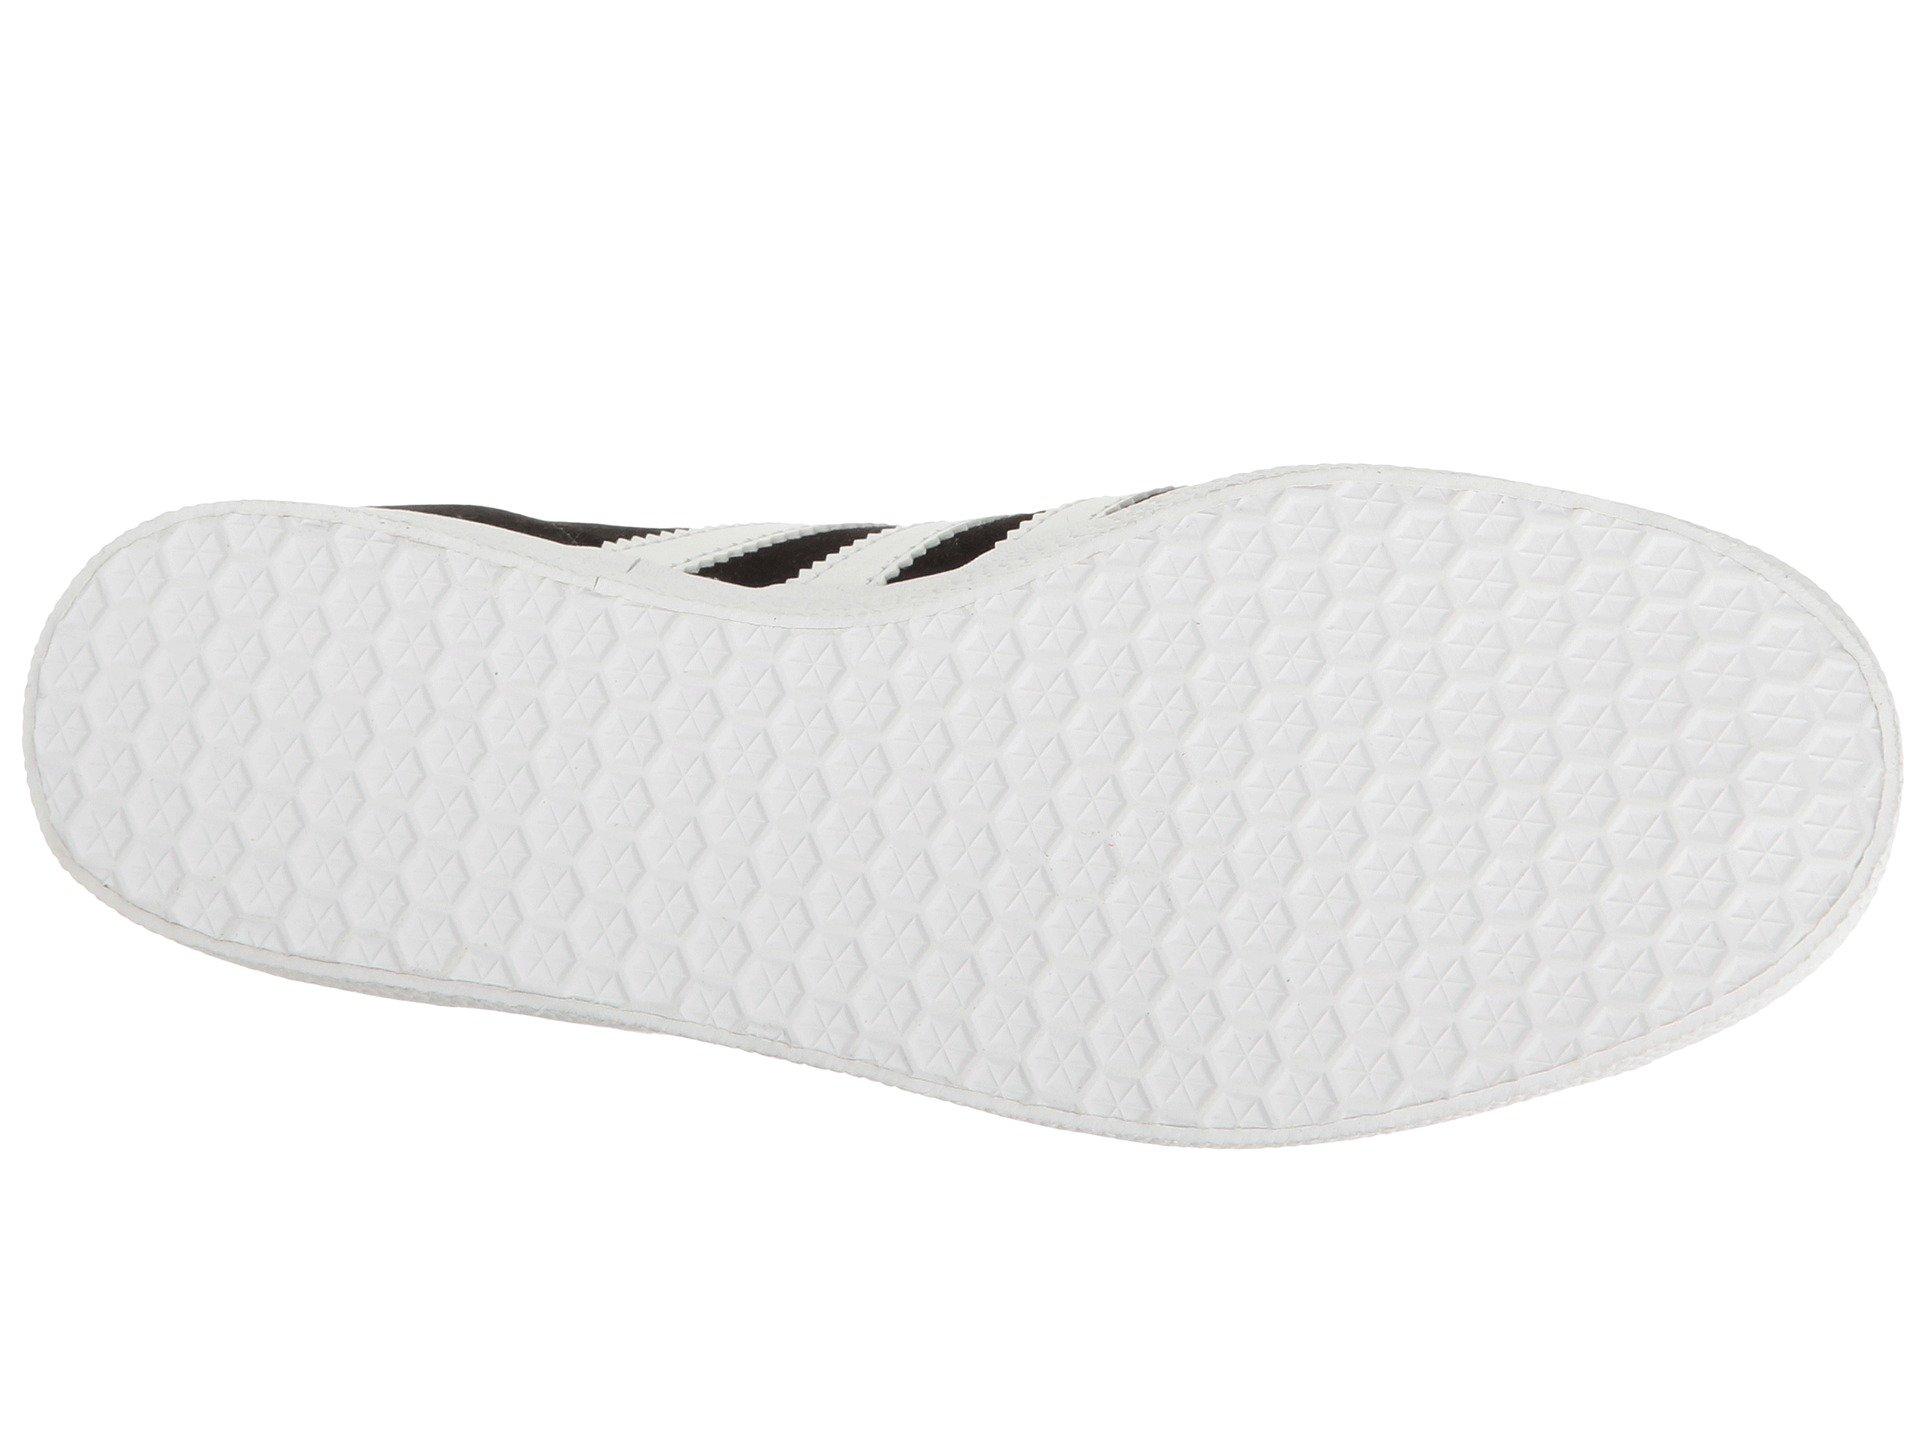 adidas gazelle zappos